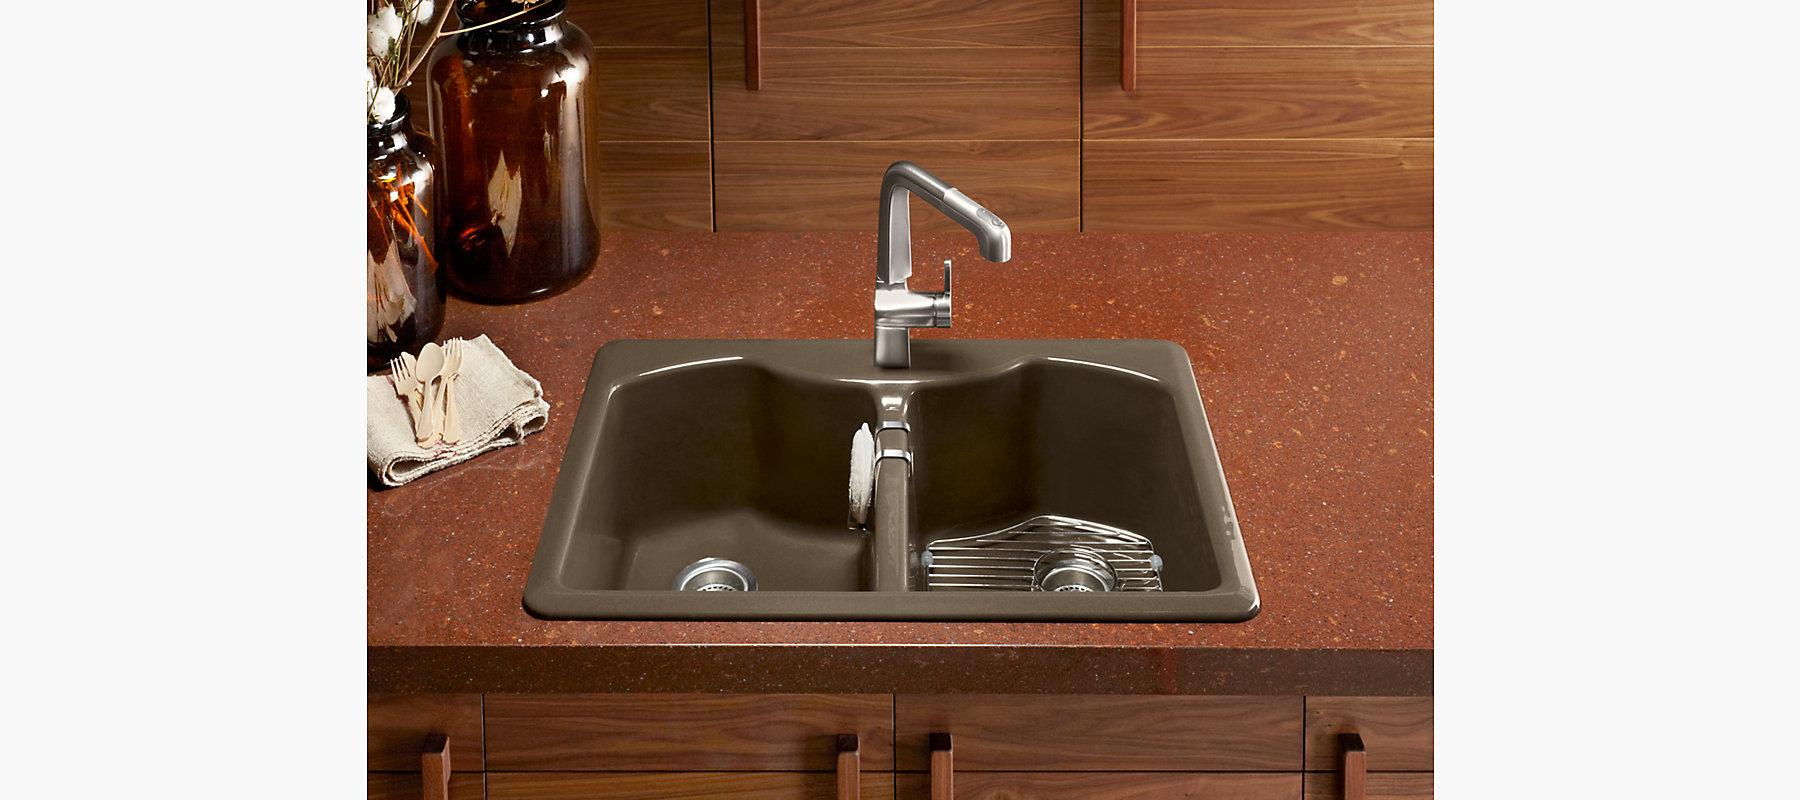 Bellegrove Kitchen Sink with Single Faucet Hole   K-6482-1A4   KOHLER